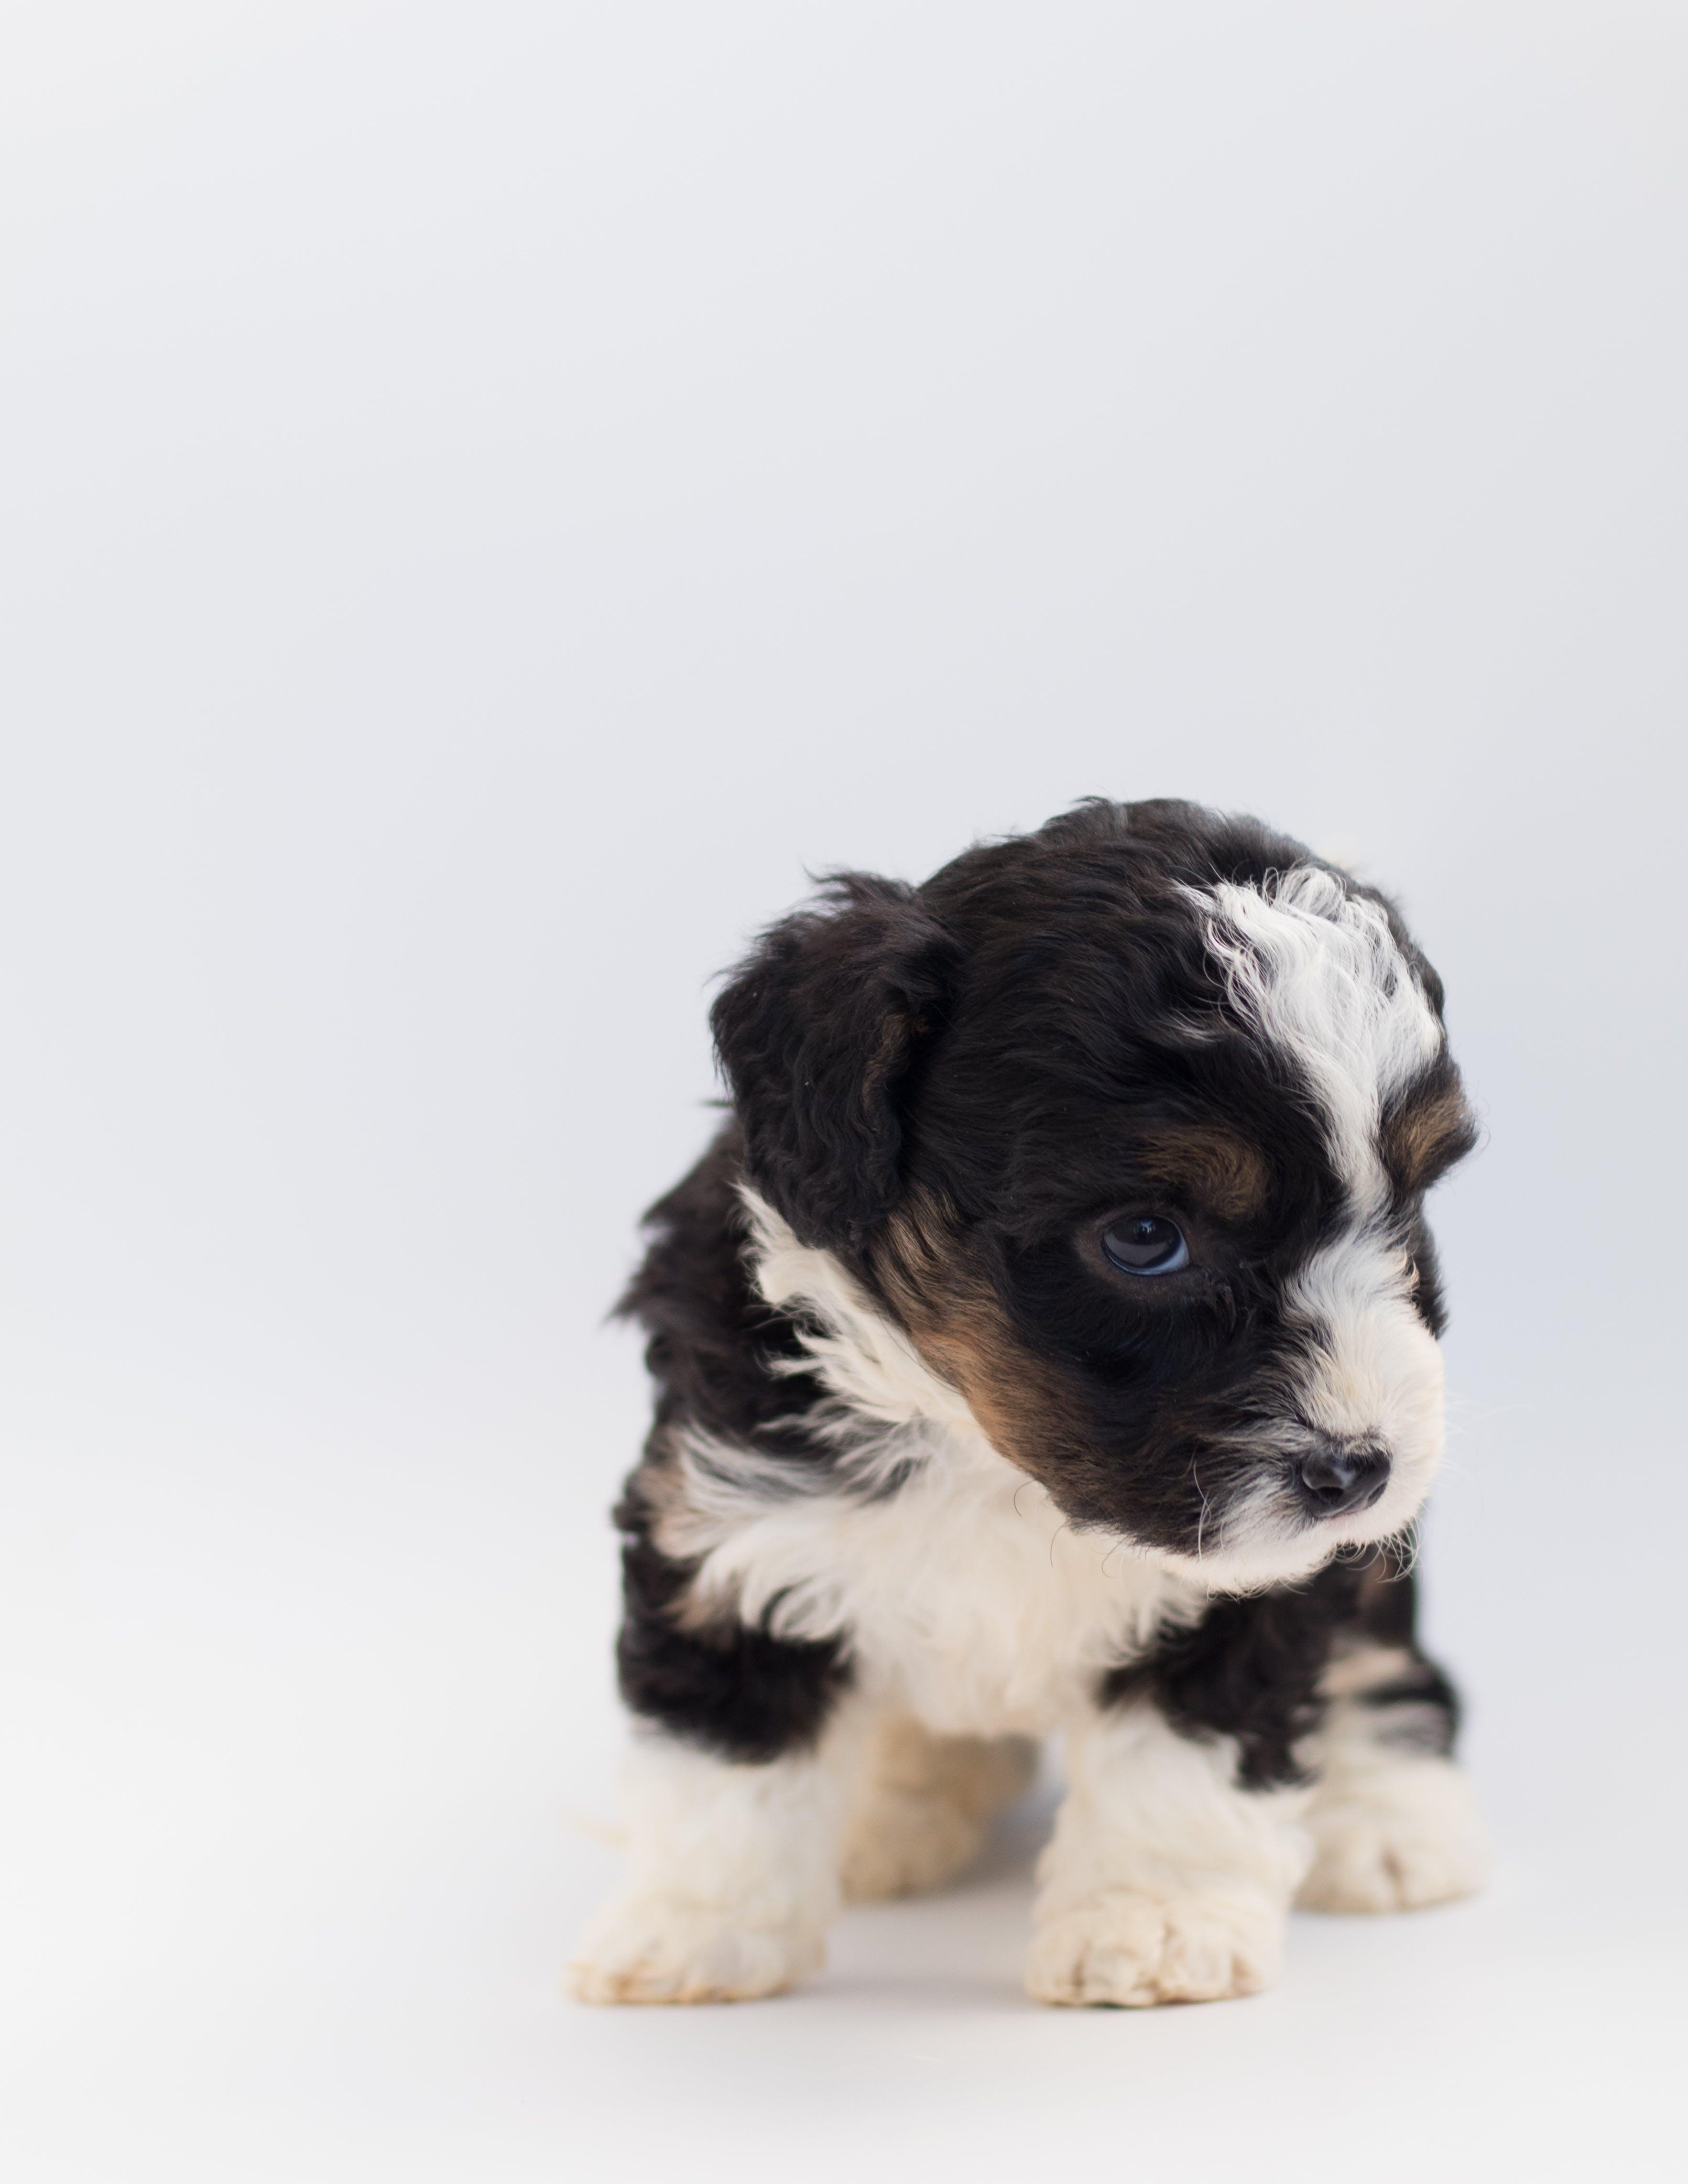 Kostenloses Stock Foto zu bernedoodle, berner sennenhund, bezaubernd, gekritzel